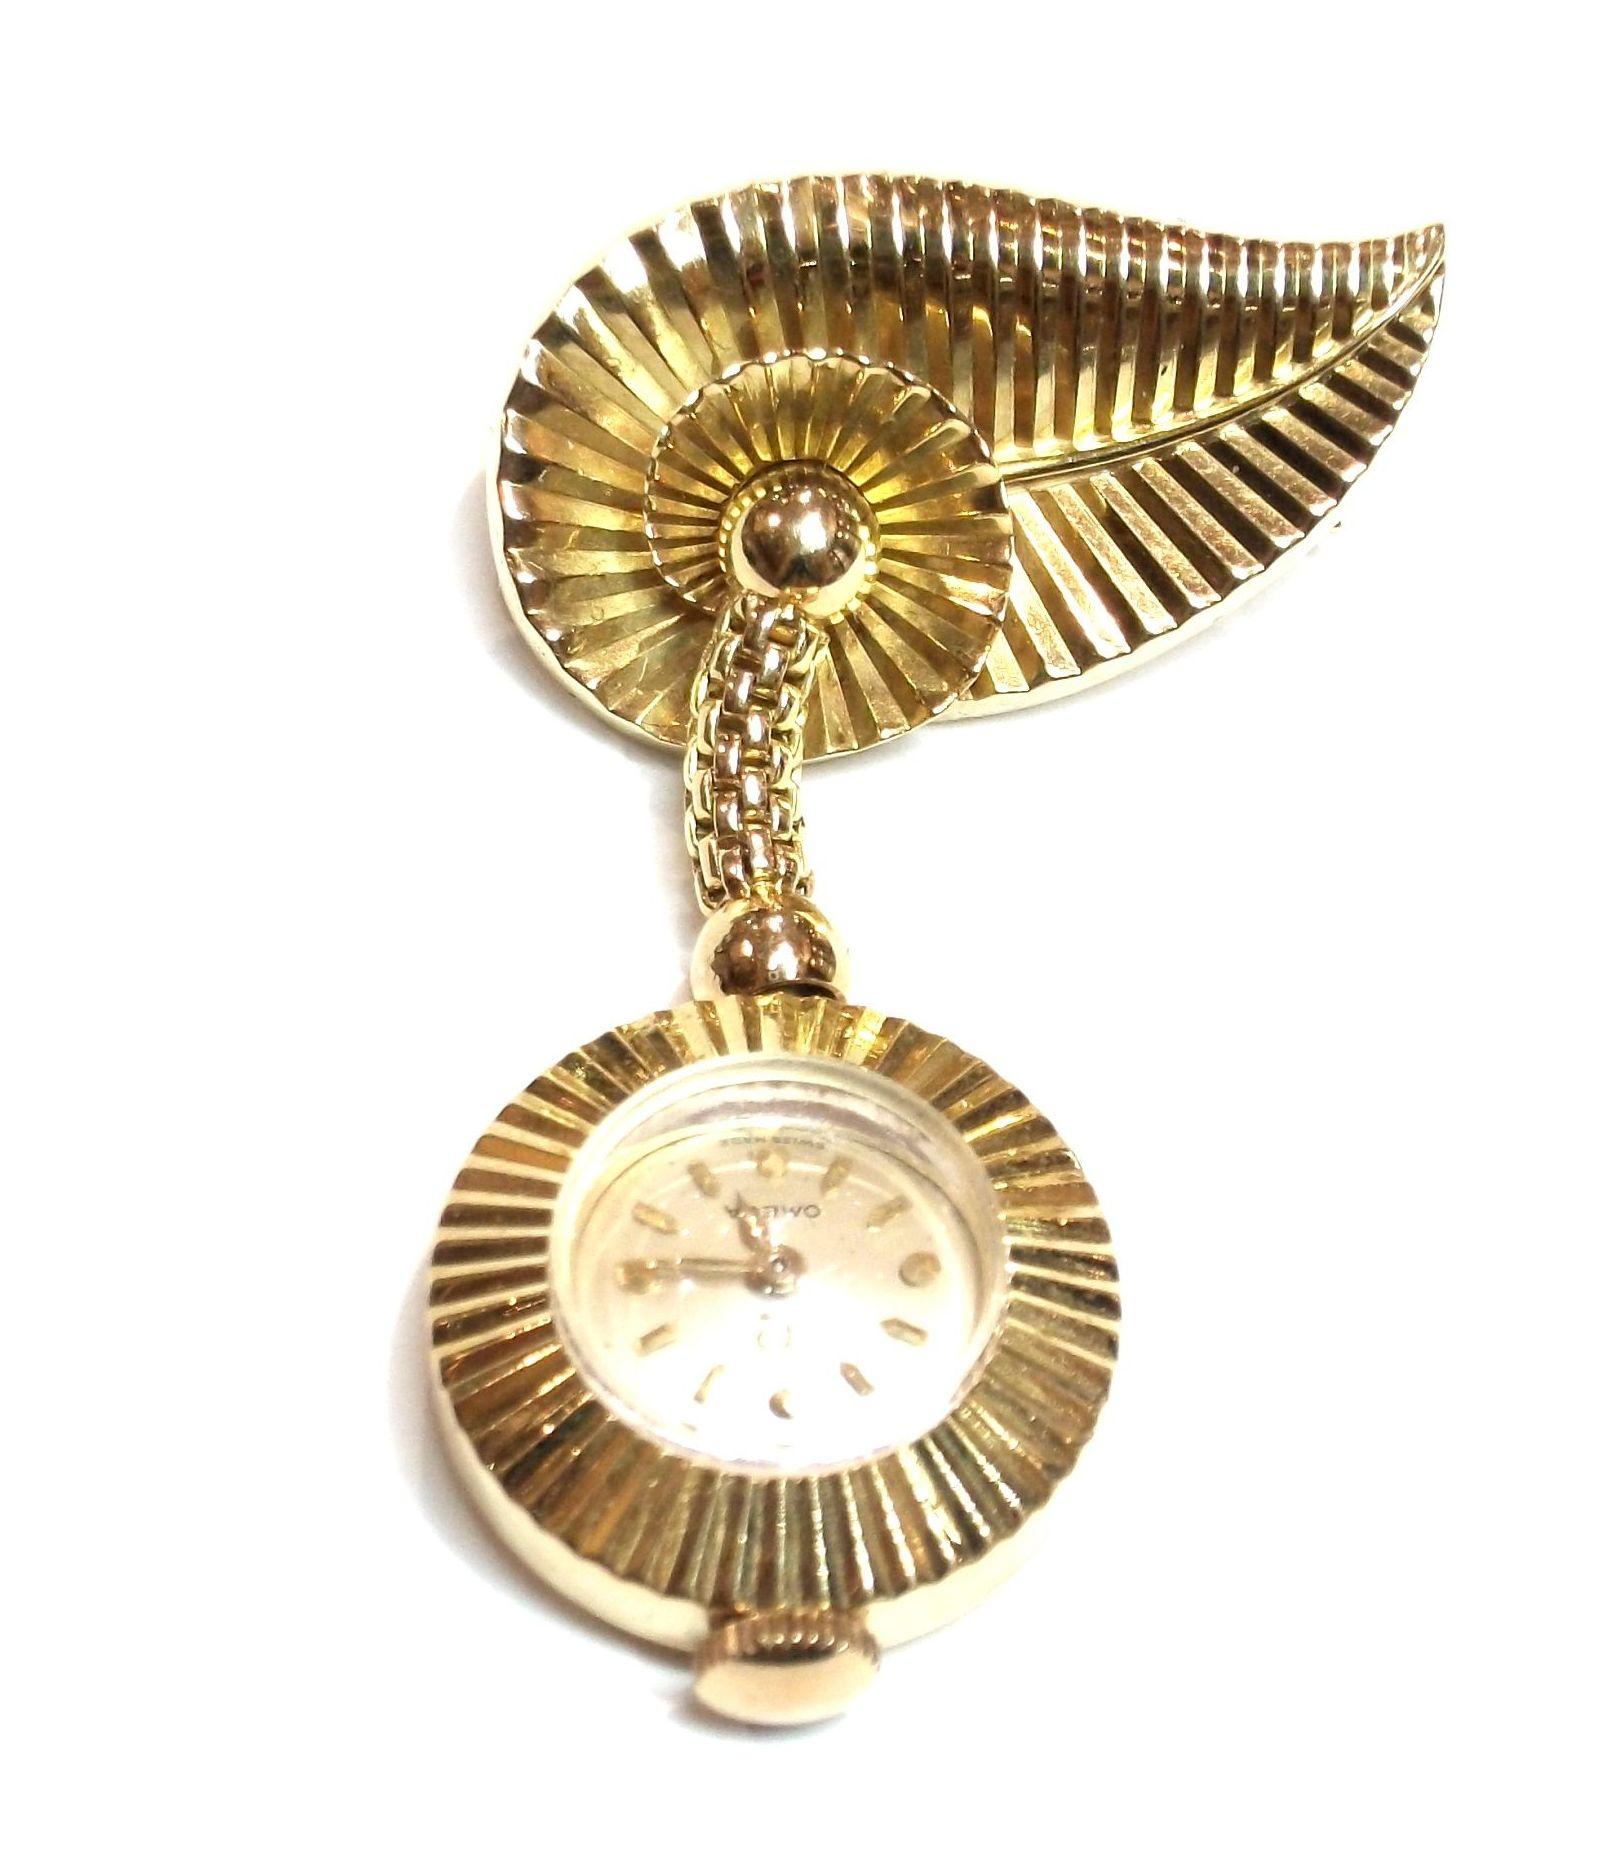 Broche con reloj colgante de marca Omega en oro 18k. 1950-60.: Catálogo de Antigua Joyeros